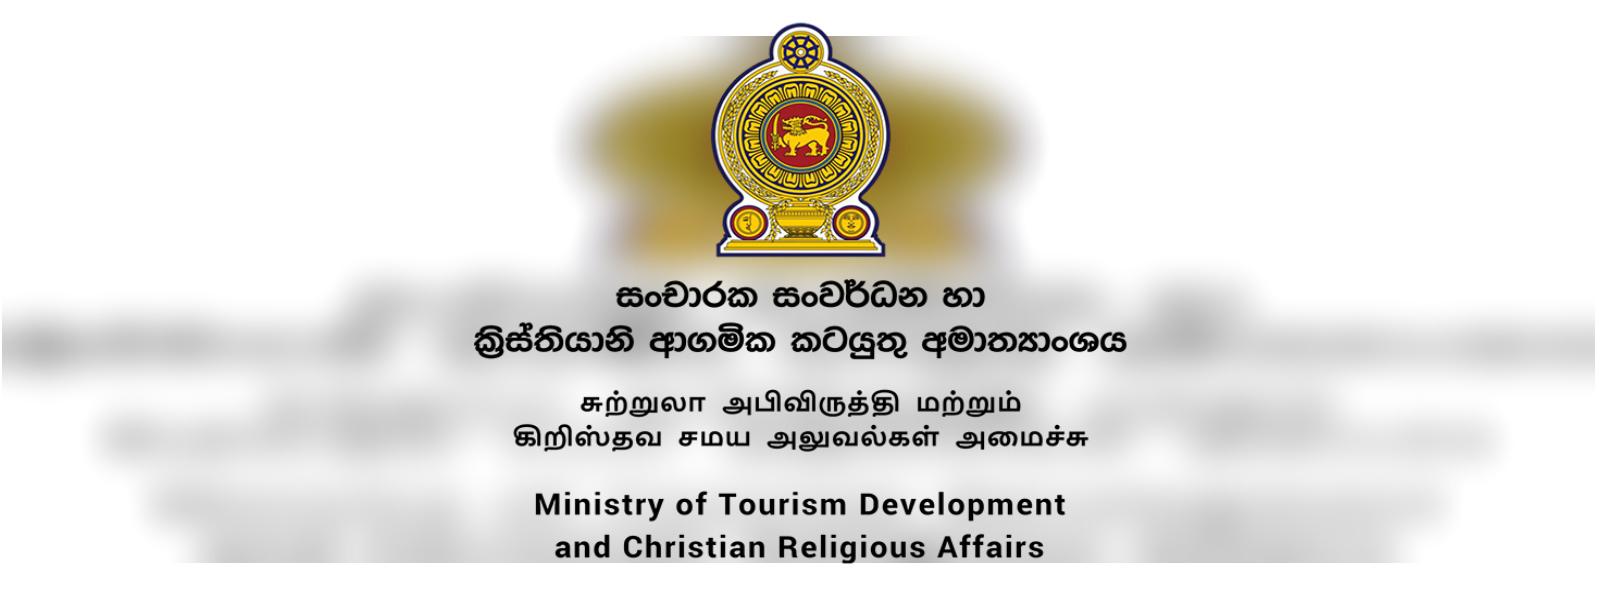 45 countries eligible to receive free visa on arrival to Sri Lanka